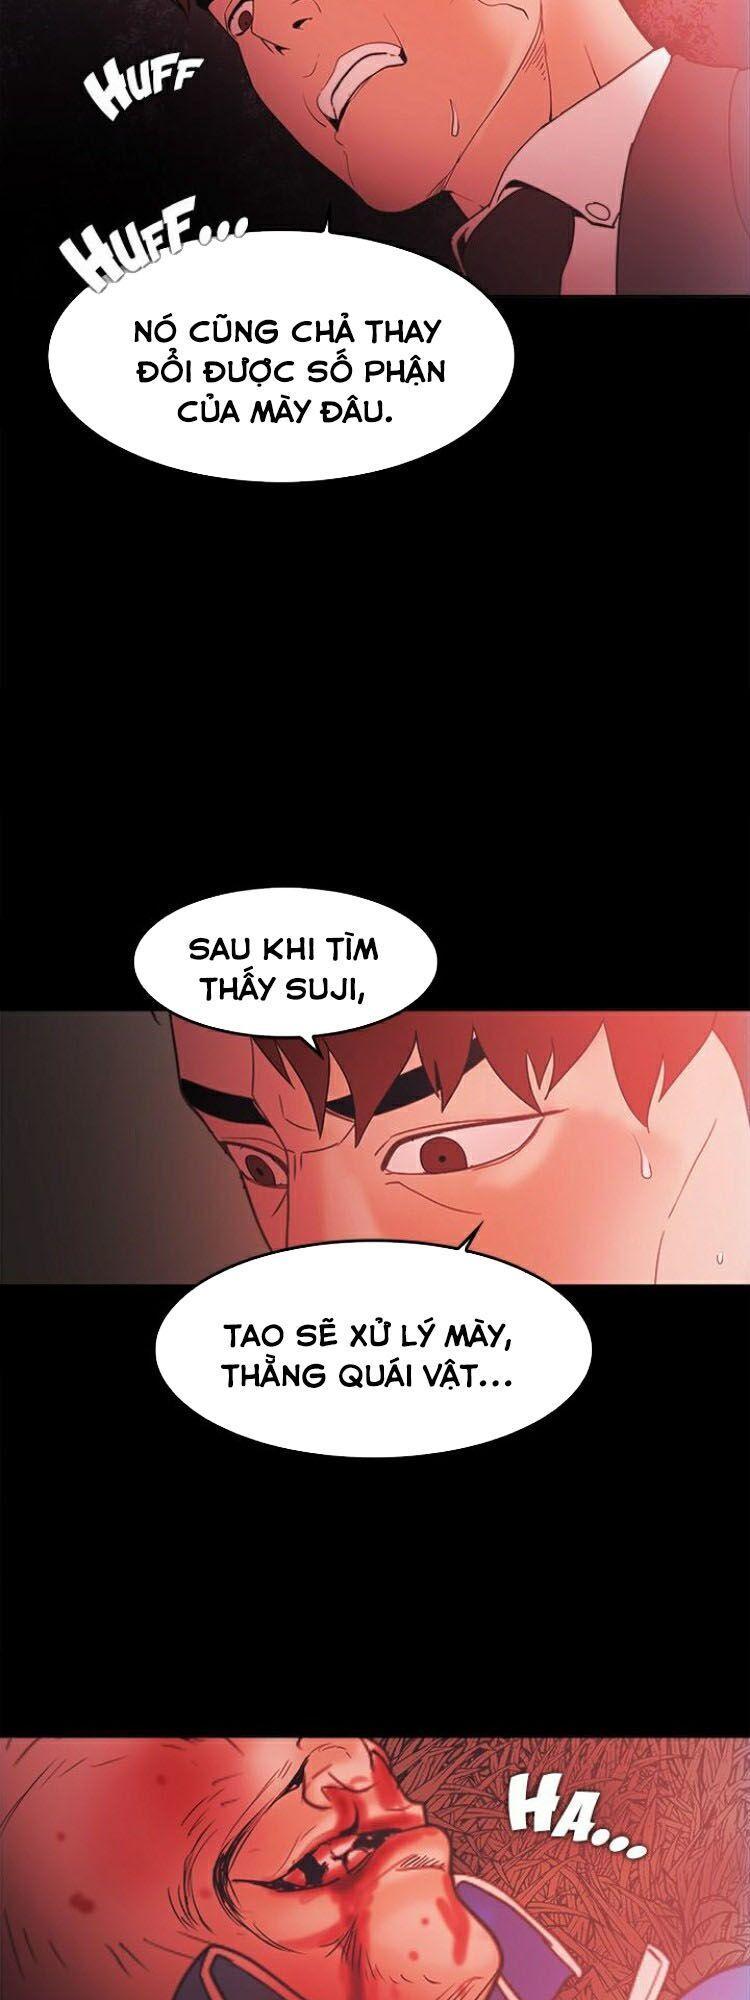 Loser Chapter 71 - Trang 34